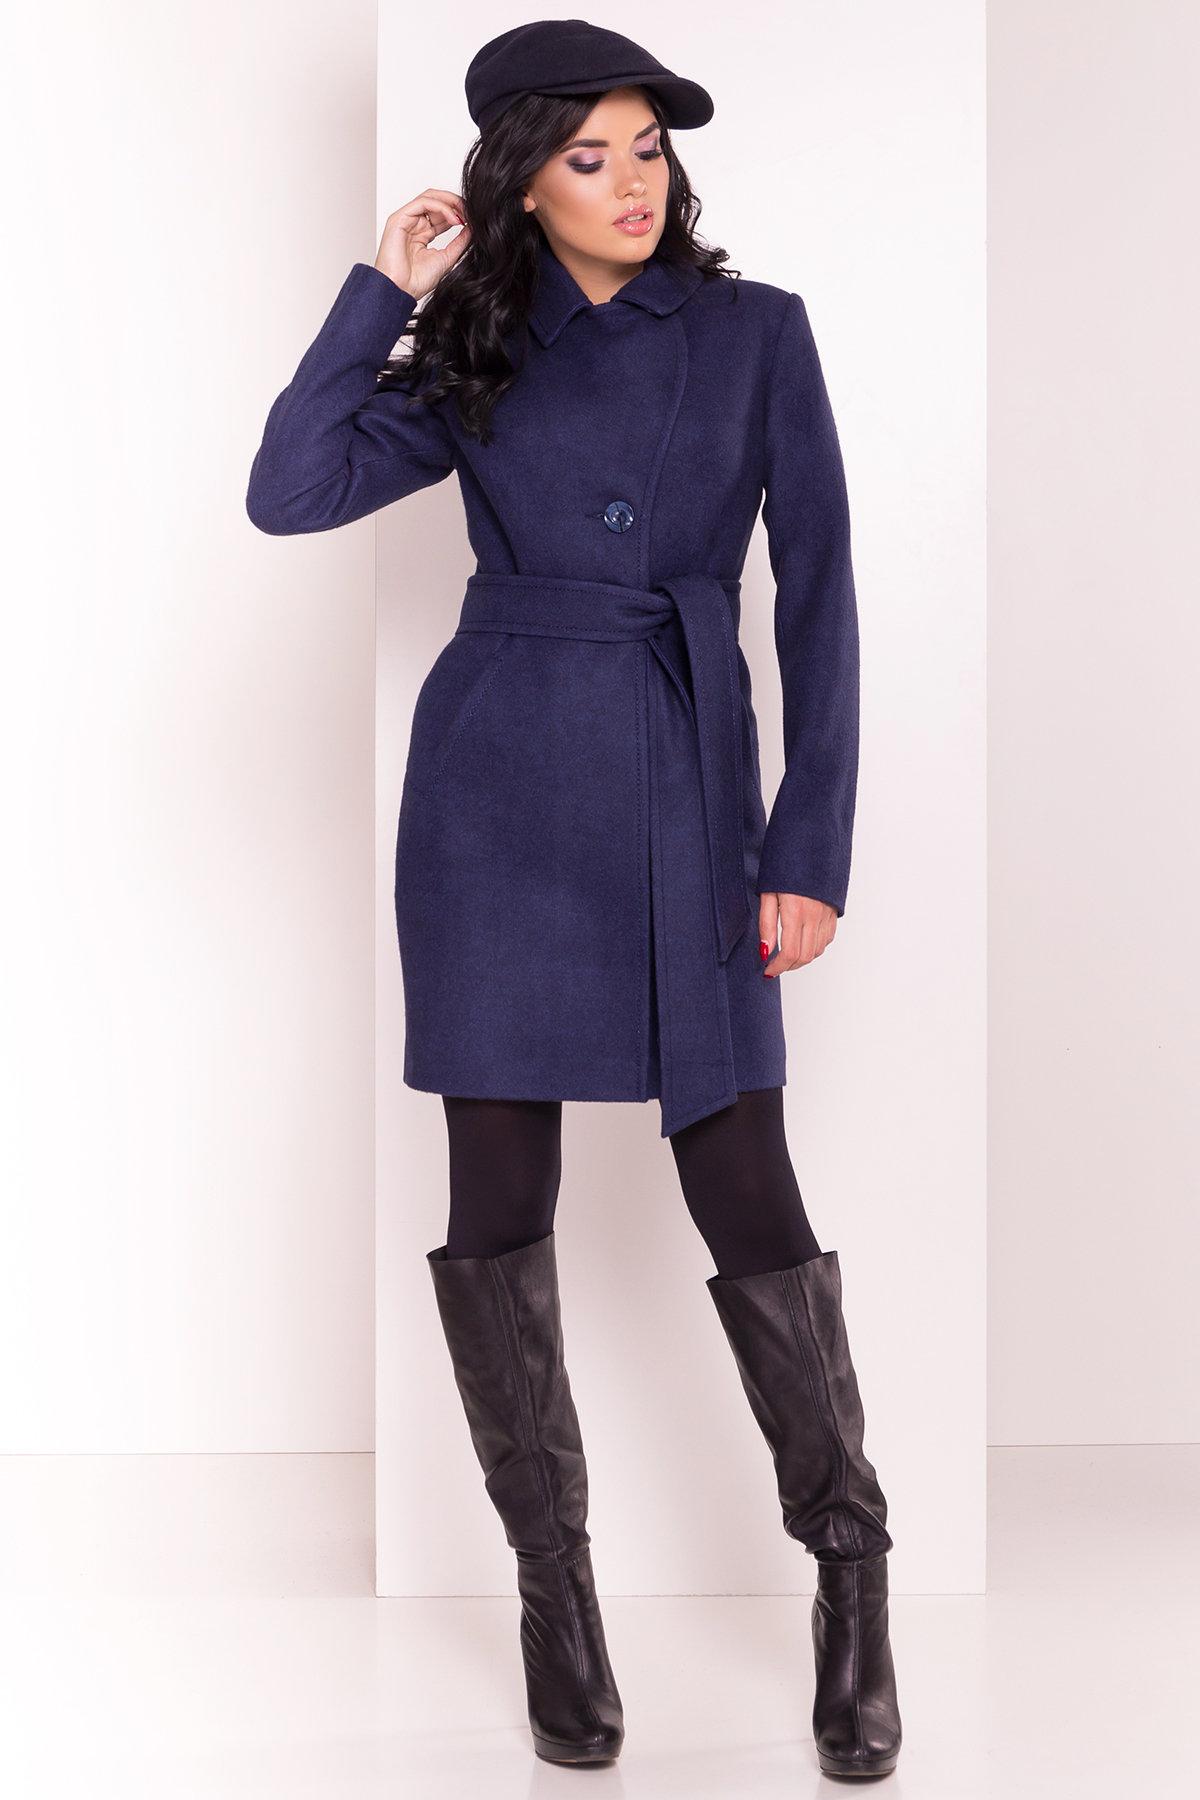 Пальто Камила 5373 АРТ. 36549 Цвет: Темно-синий 17 - фото 4, интернет магазин tm-modus.ru